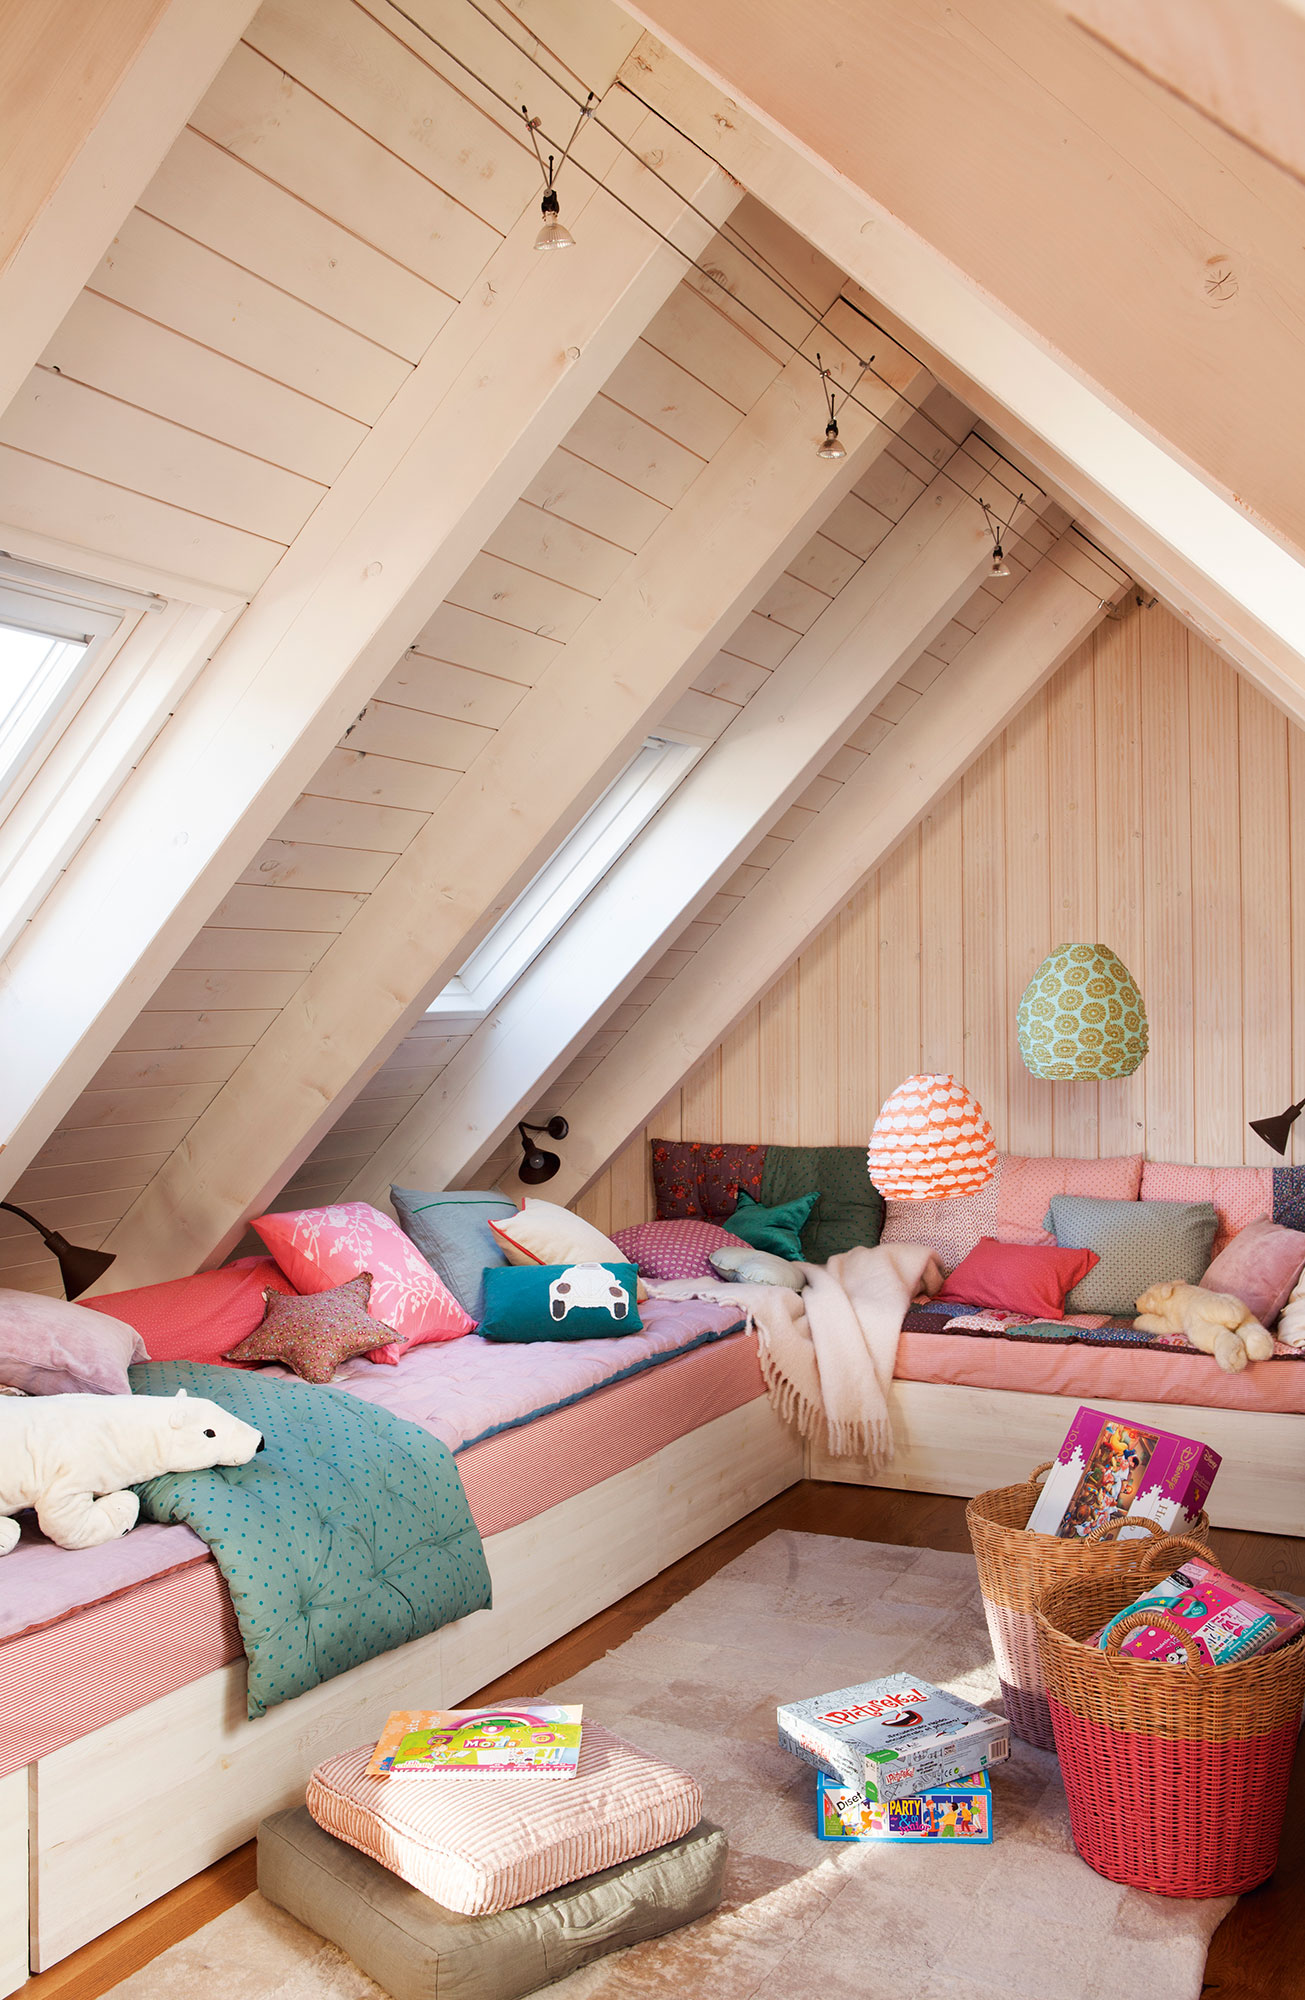 Dormitorios infantiles 7 buenas ideas para compartir - Dormitorio infantil dos camas ...